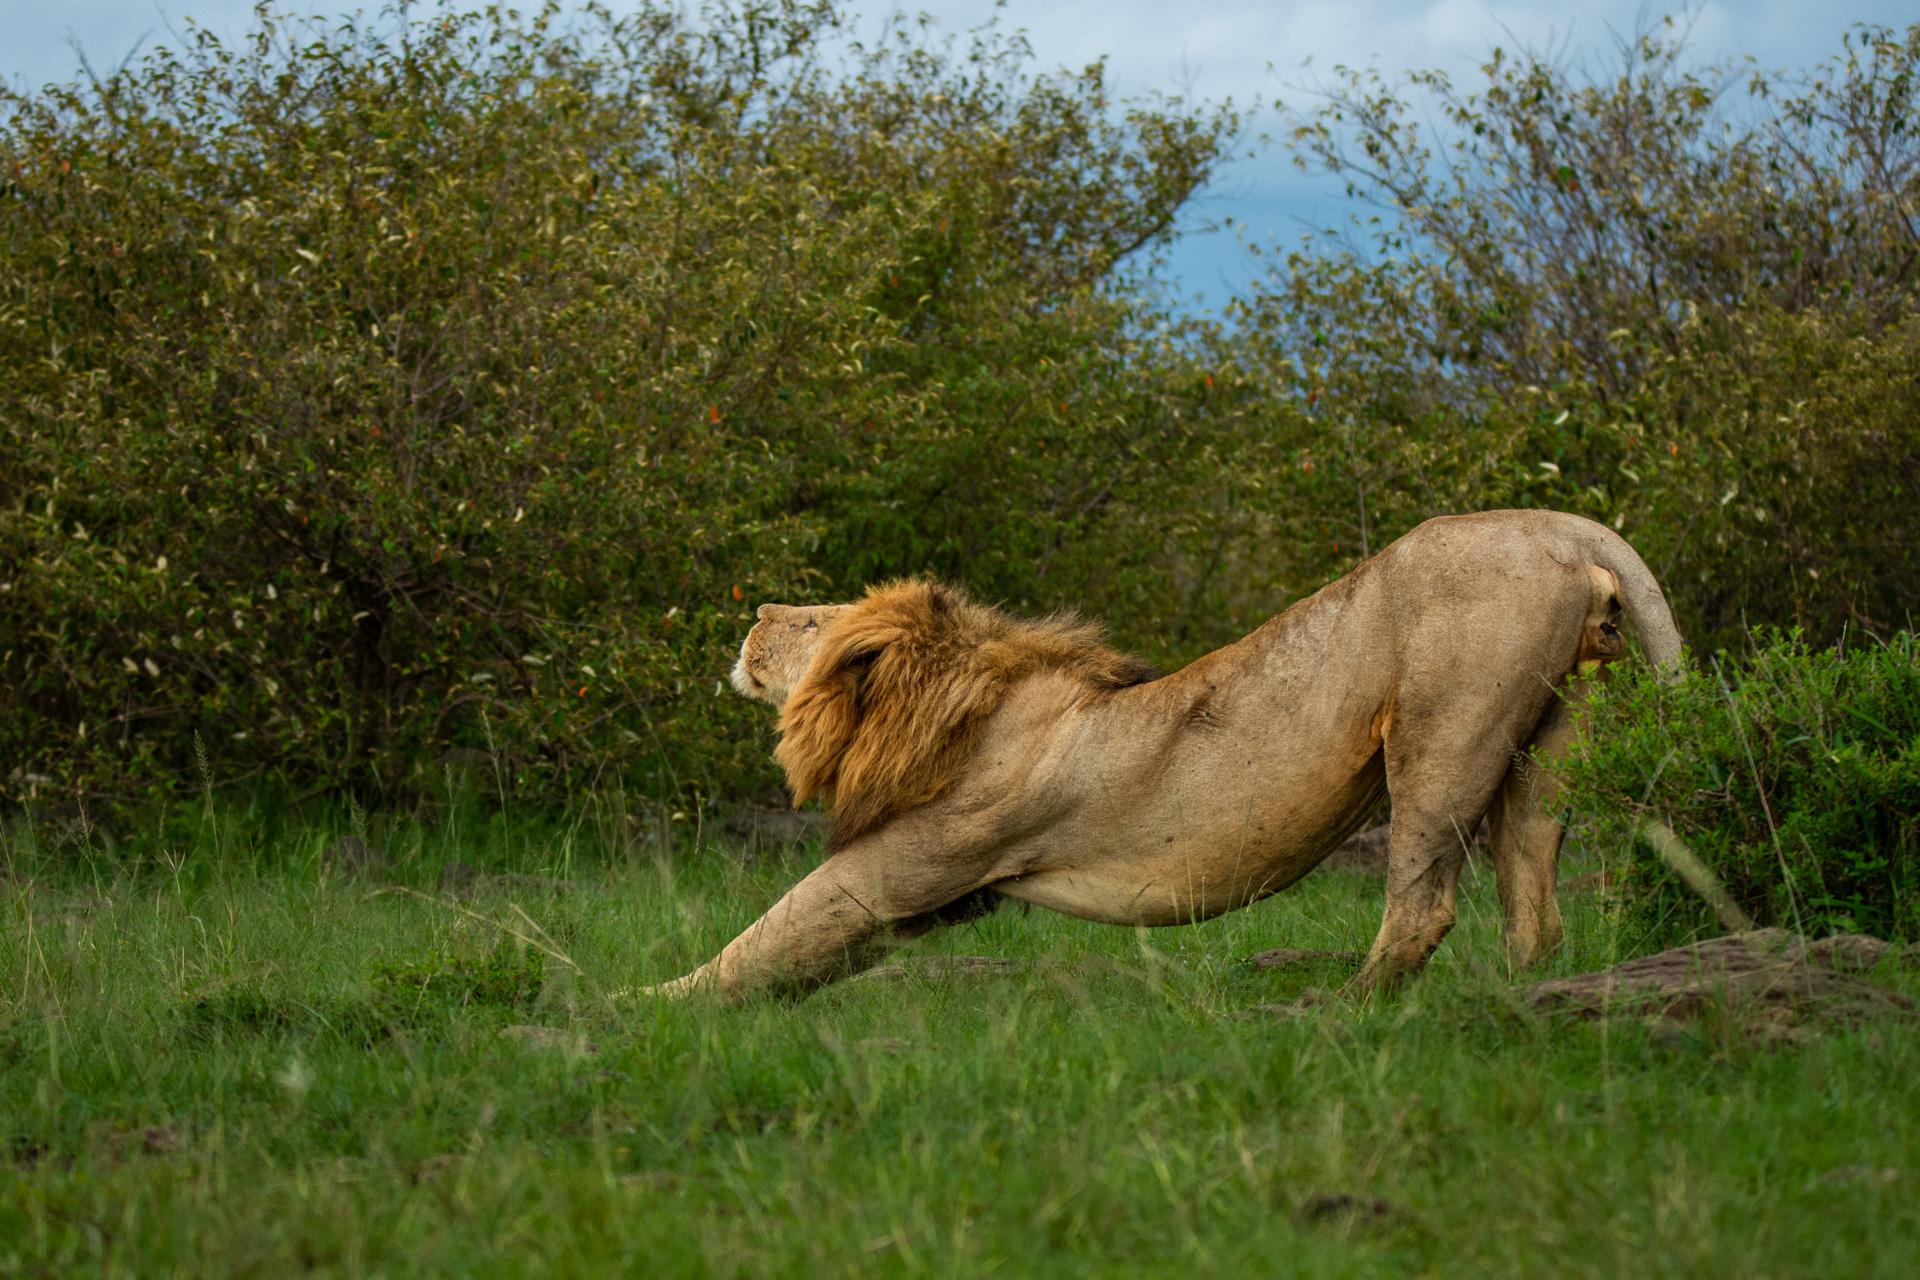 Lion stretching